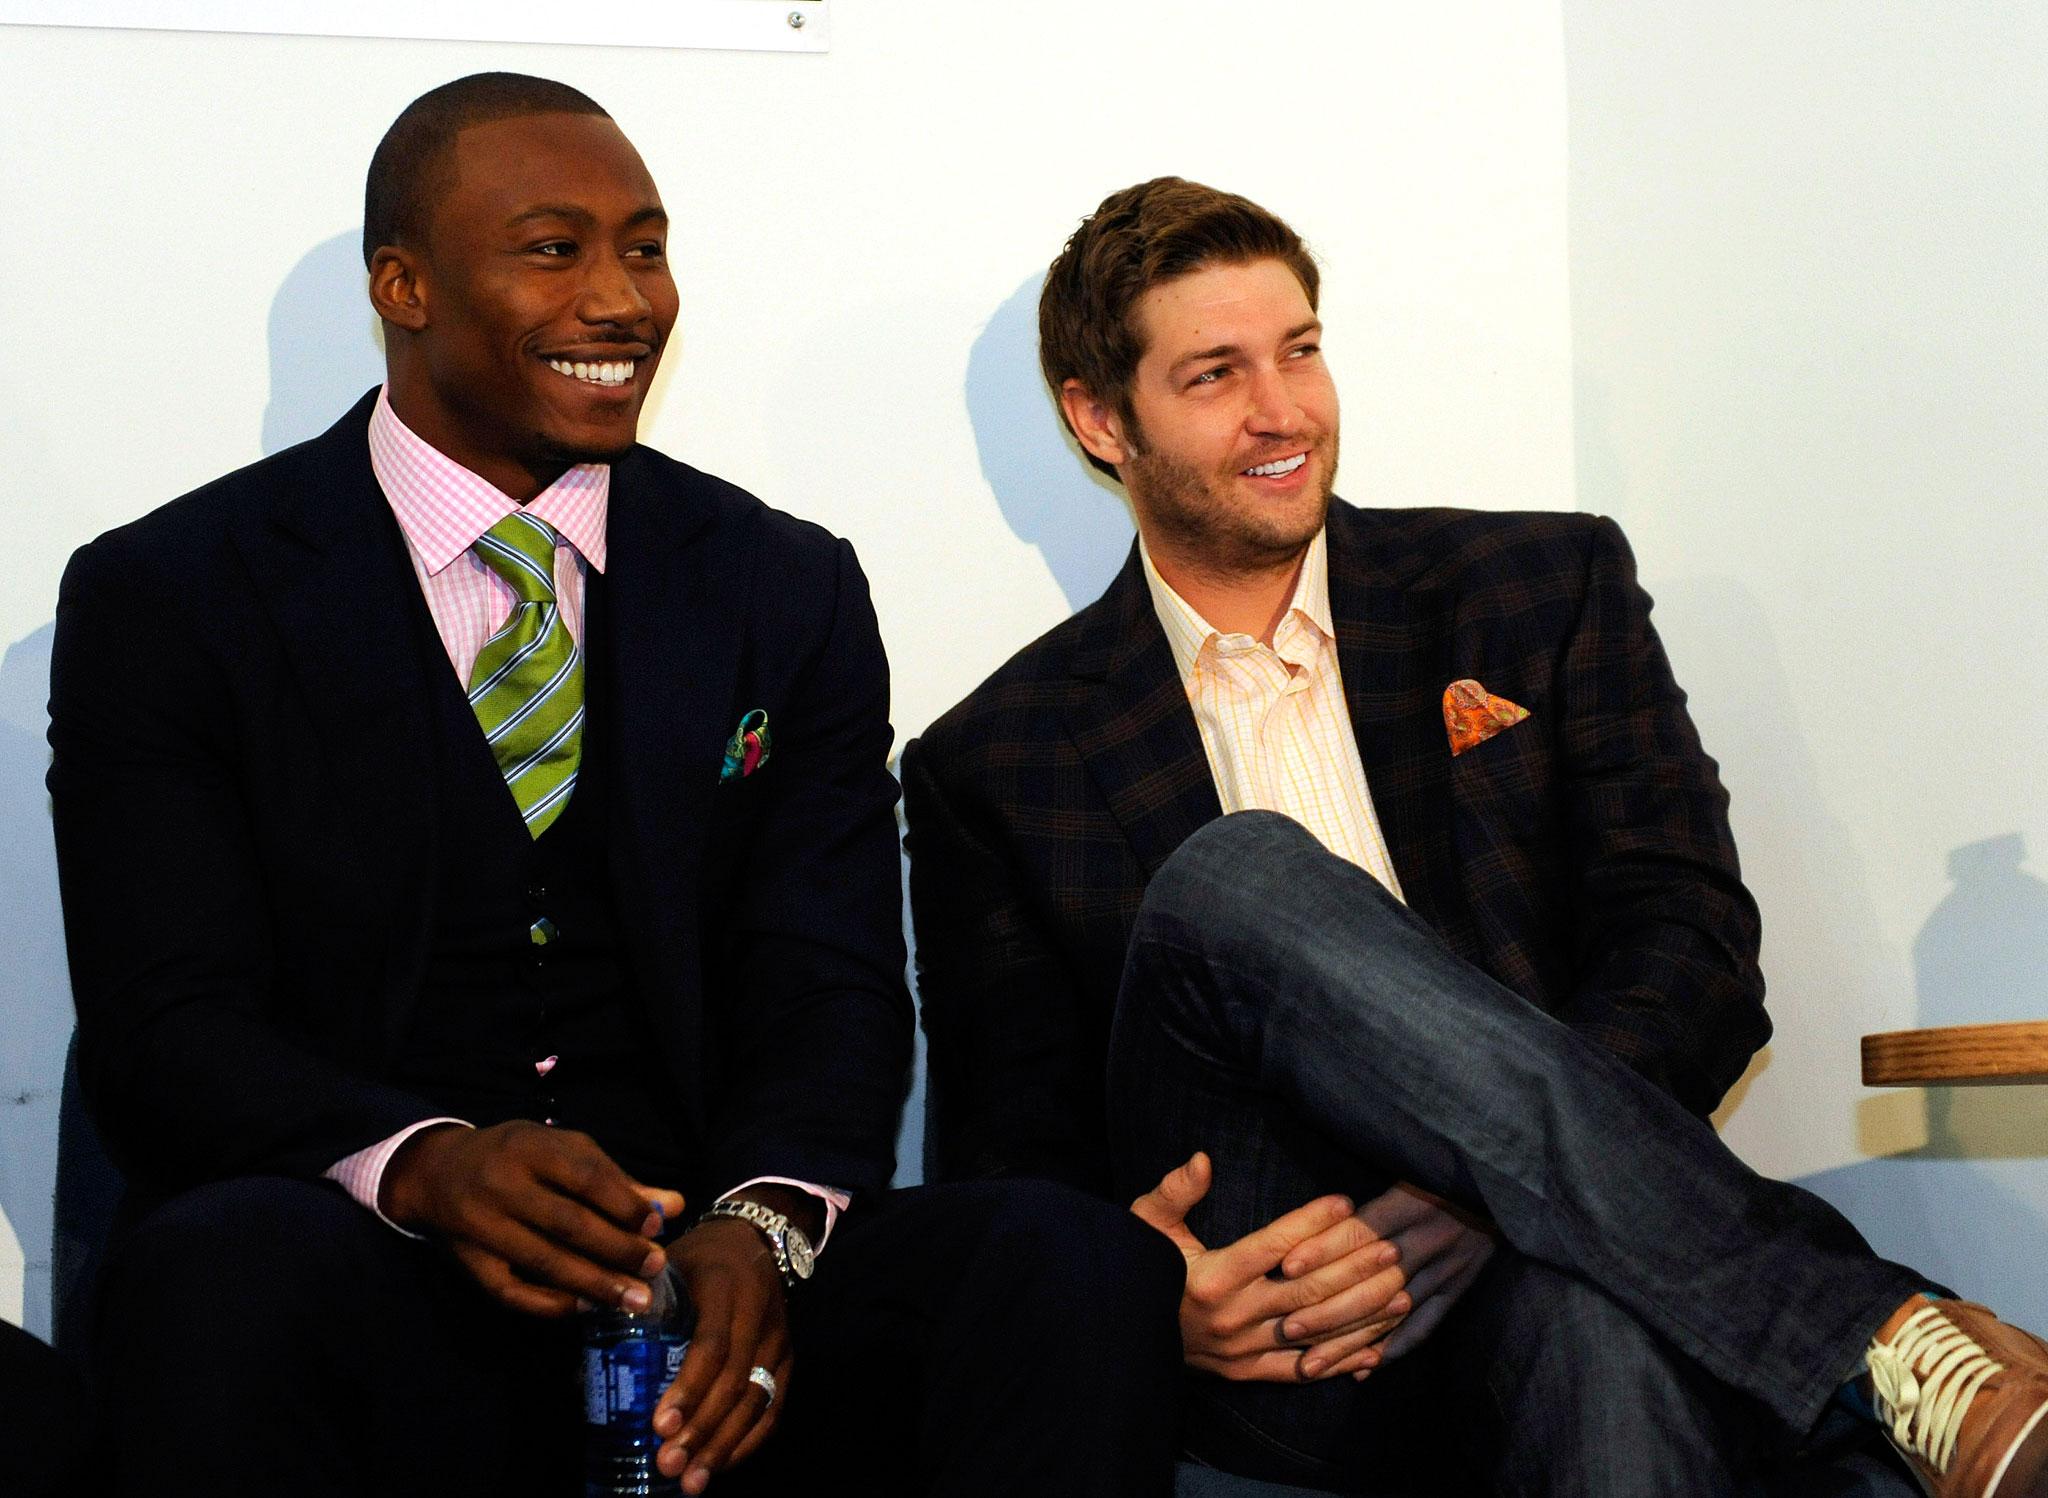 Jay Cutler and  Brandon Marshall